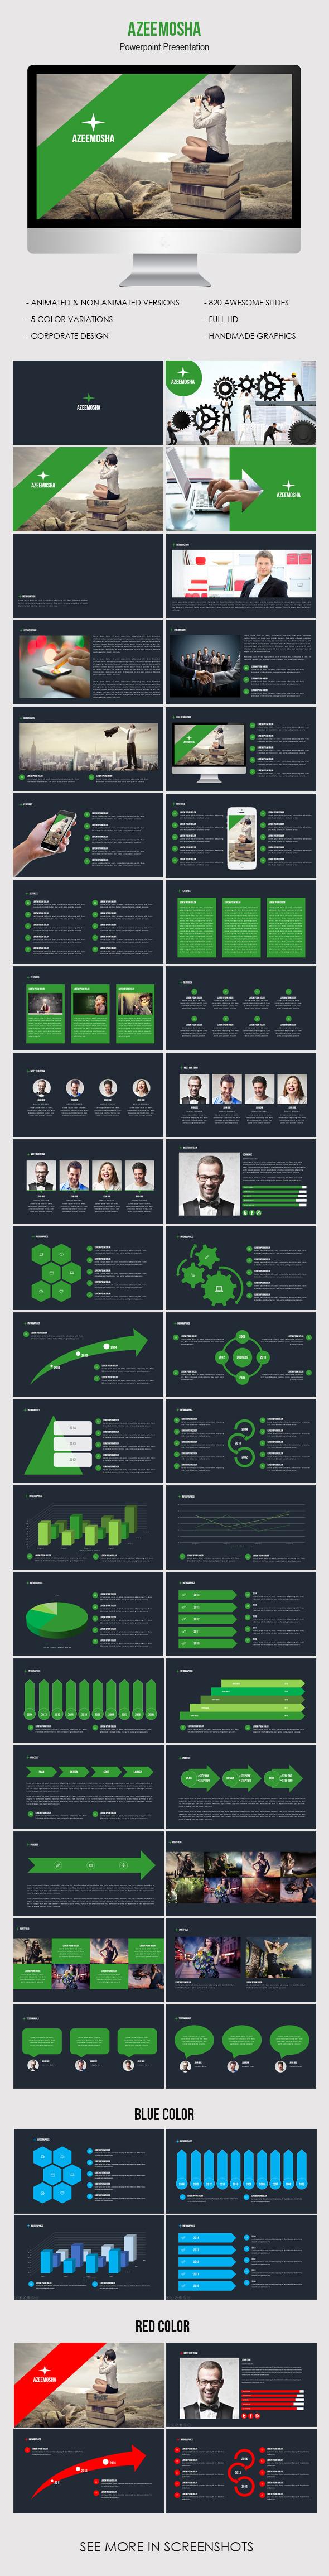 Azeemosha - Powerpoint Presentation Template - Business PowerPoint Templates